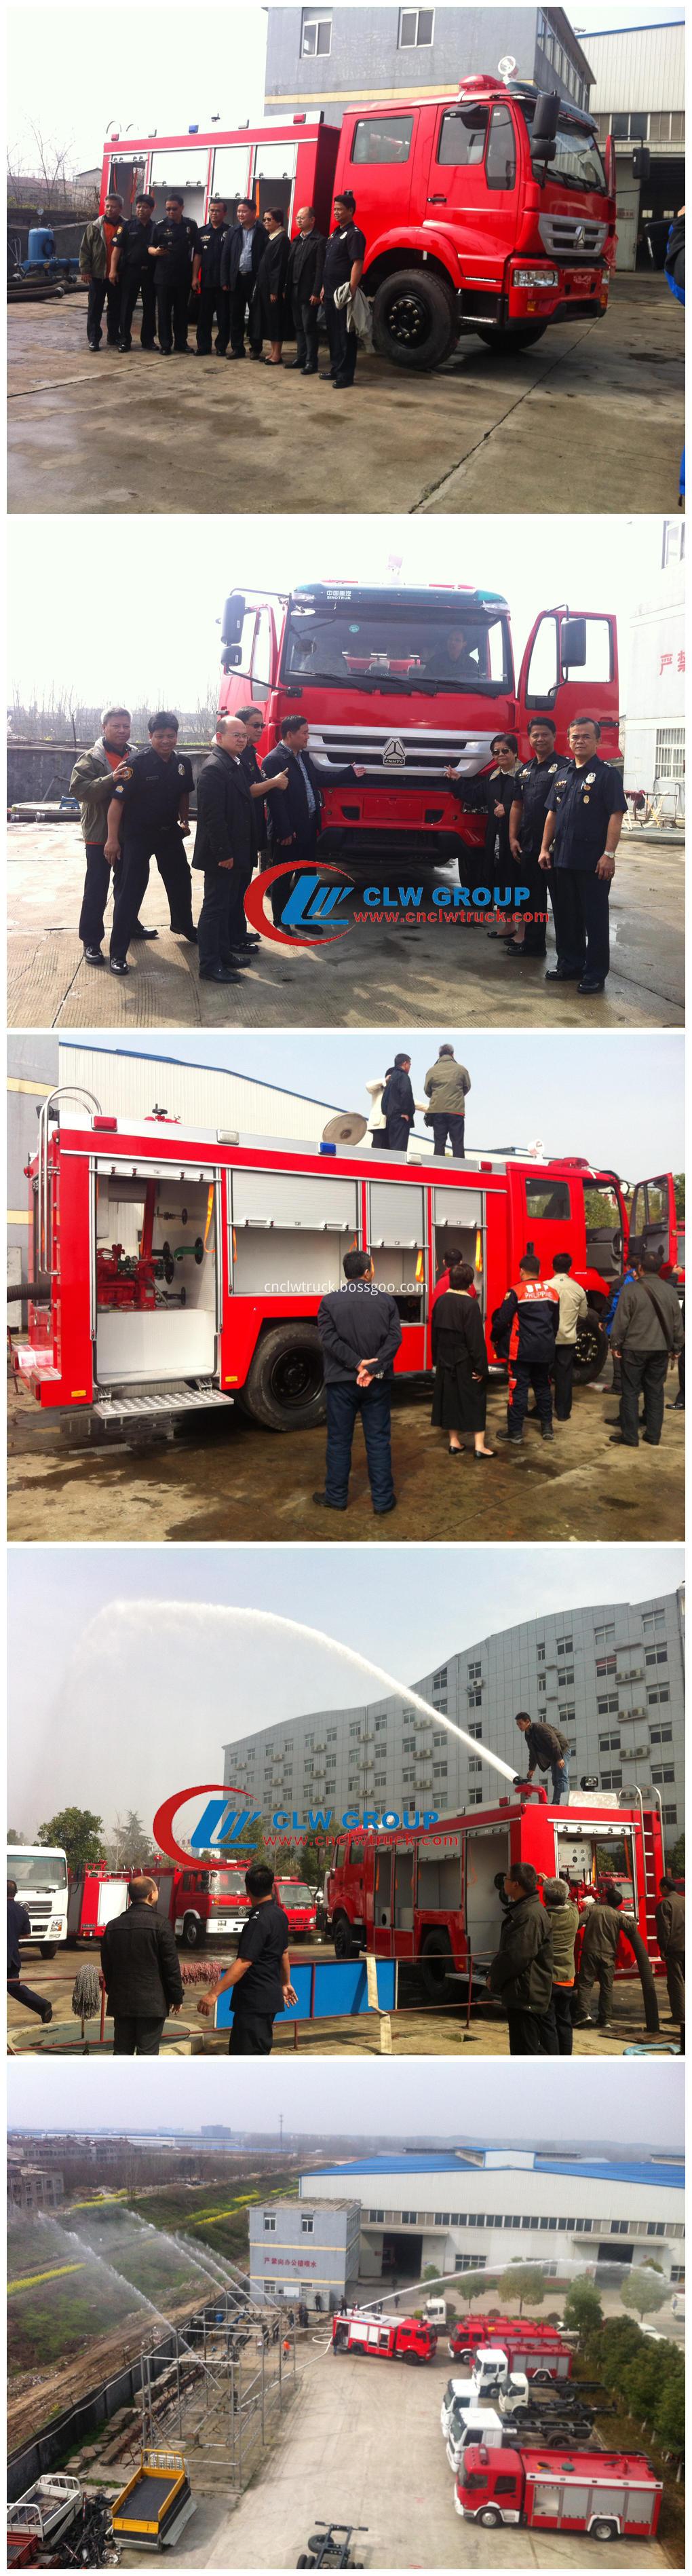 fire rescue truck customer visit